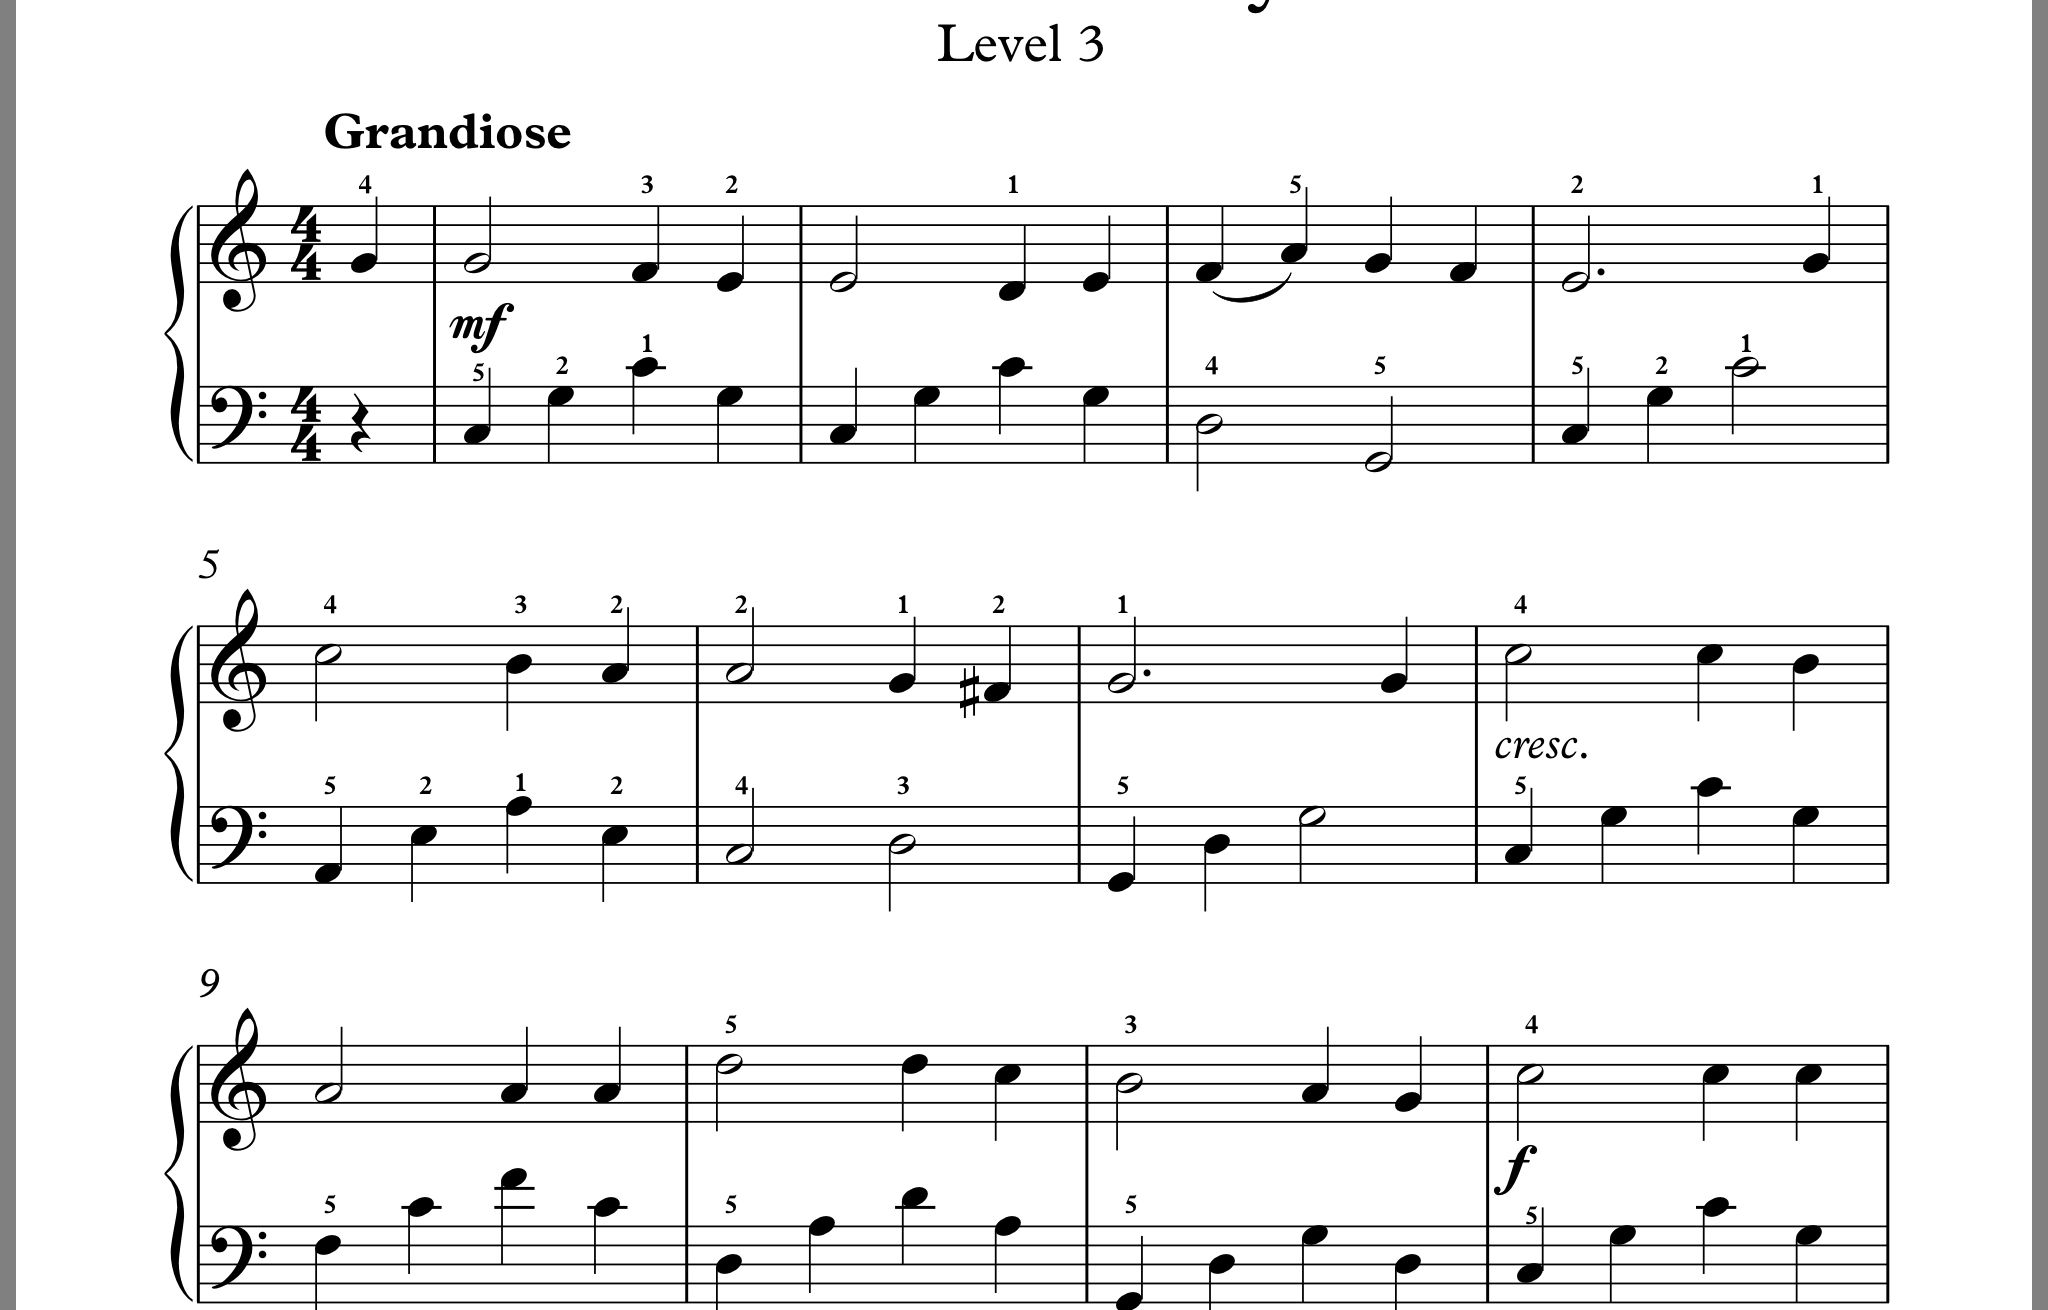 Pin by Sijtske Stegenga on Piano bladmuziek Sheet music